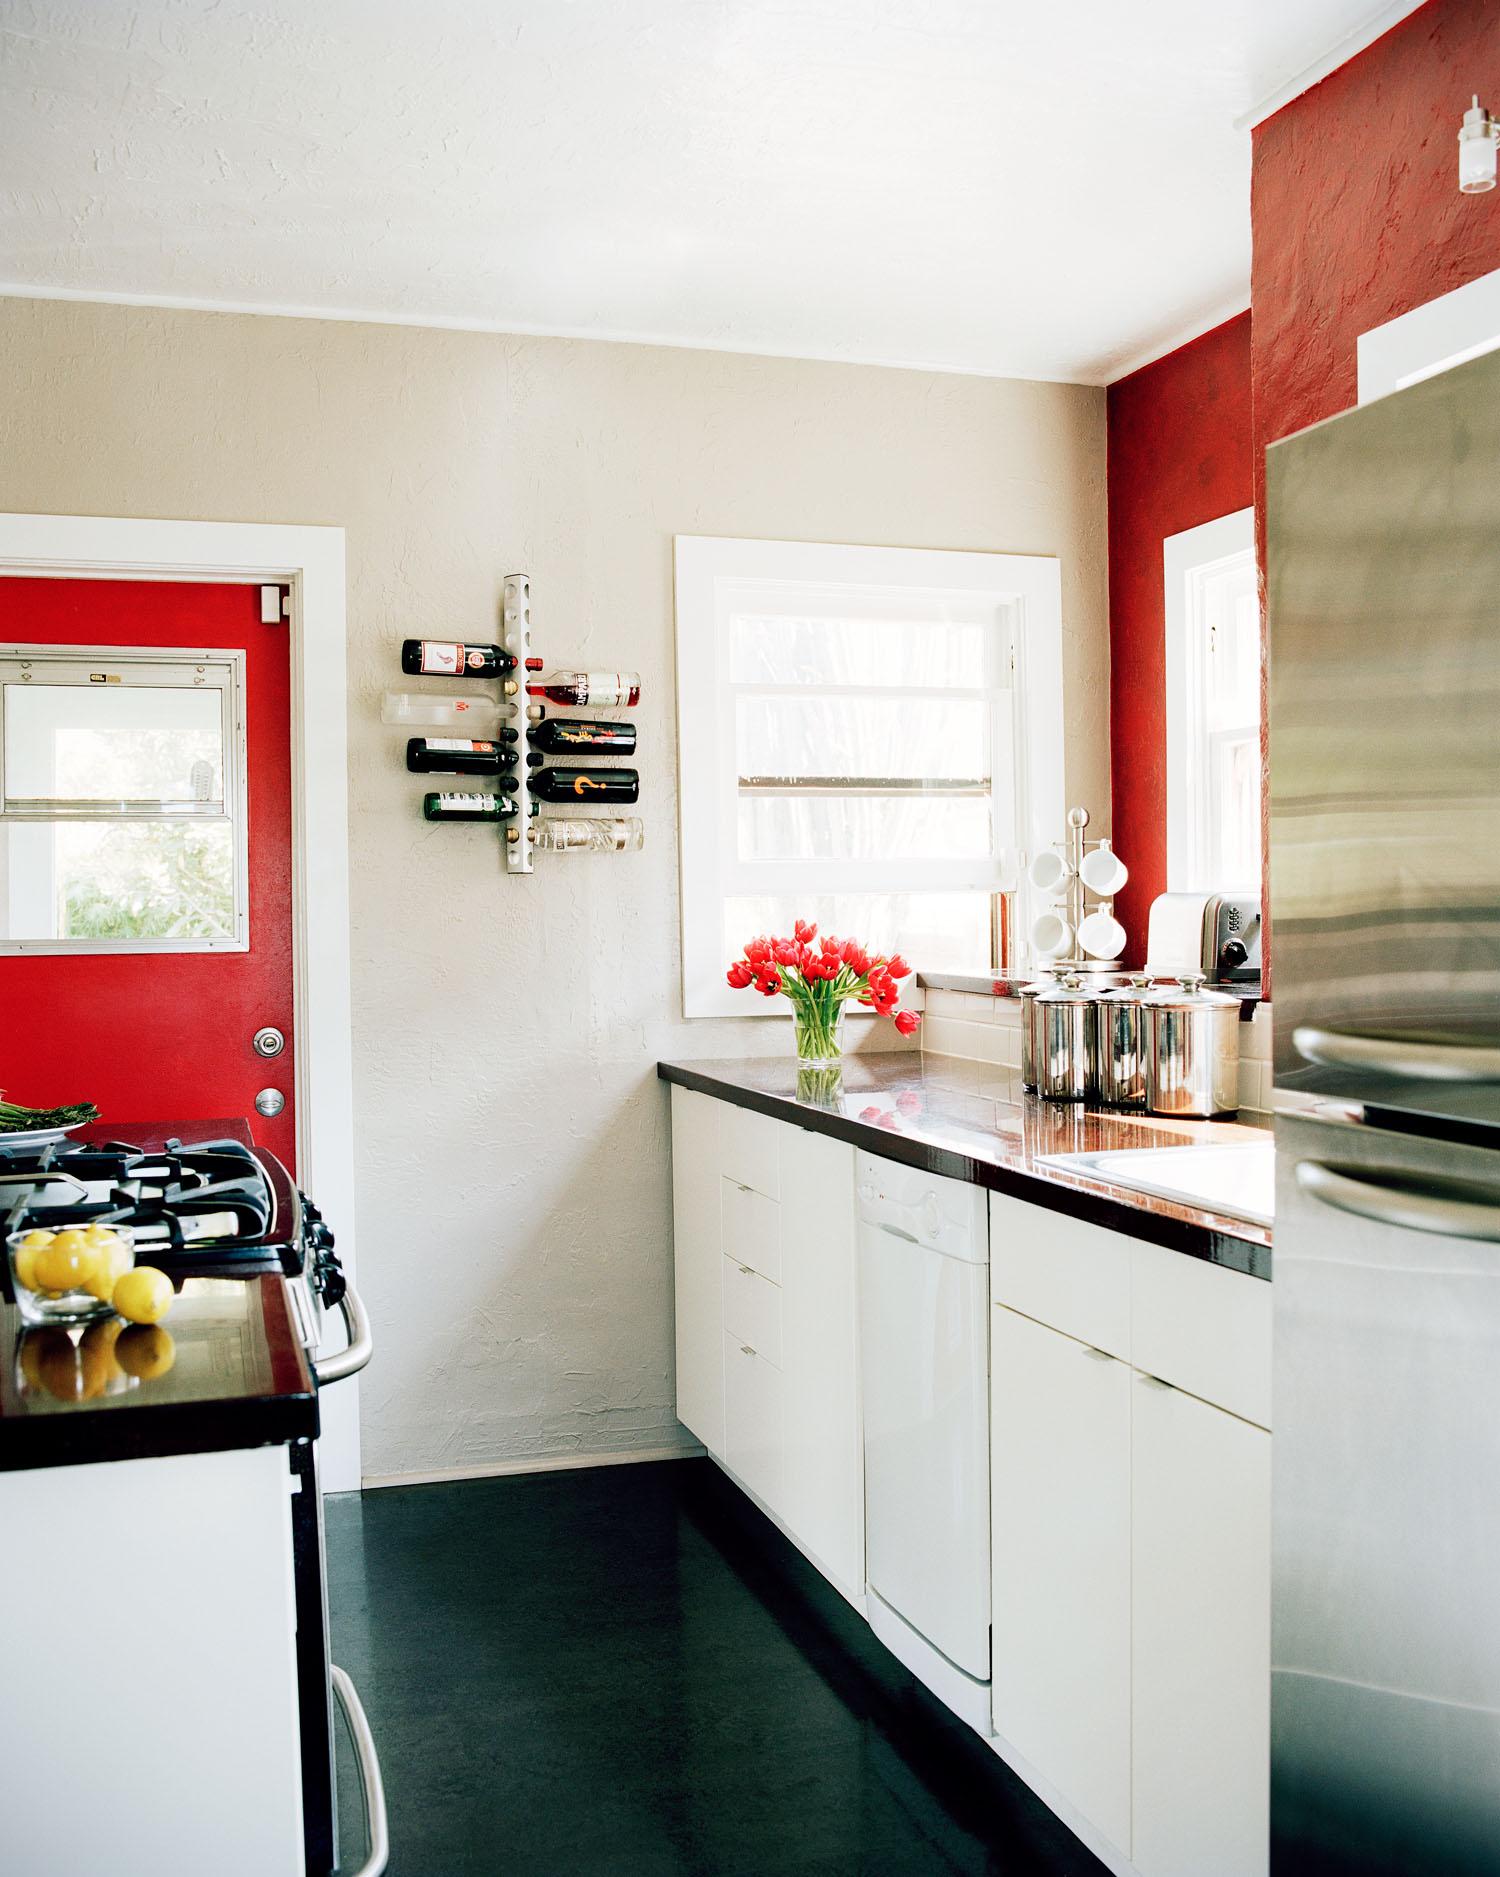 Stylish Living in 700 Square Feet - Sunset Magazine